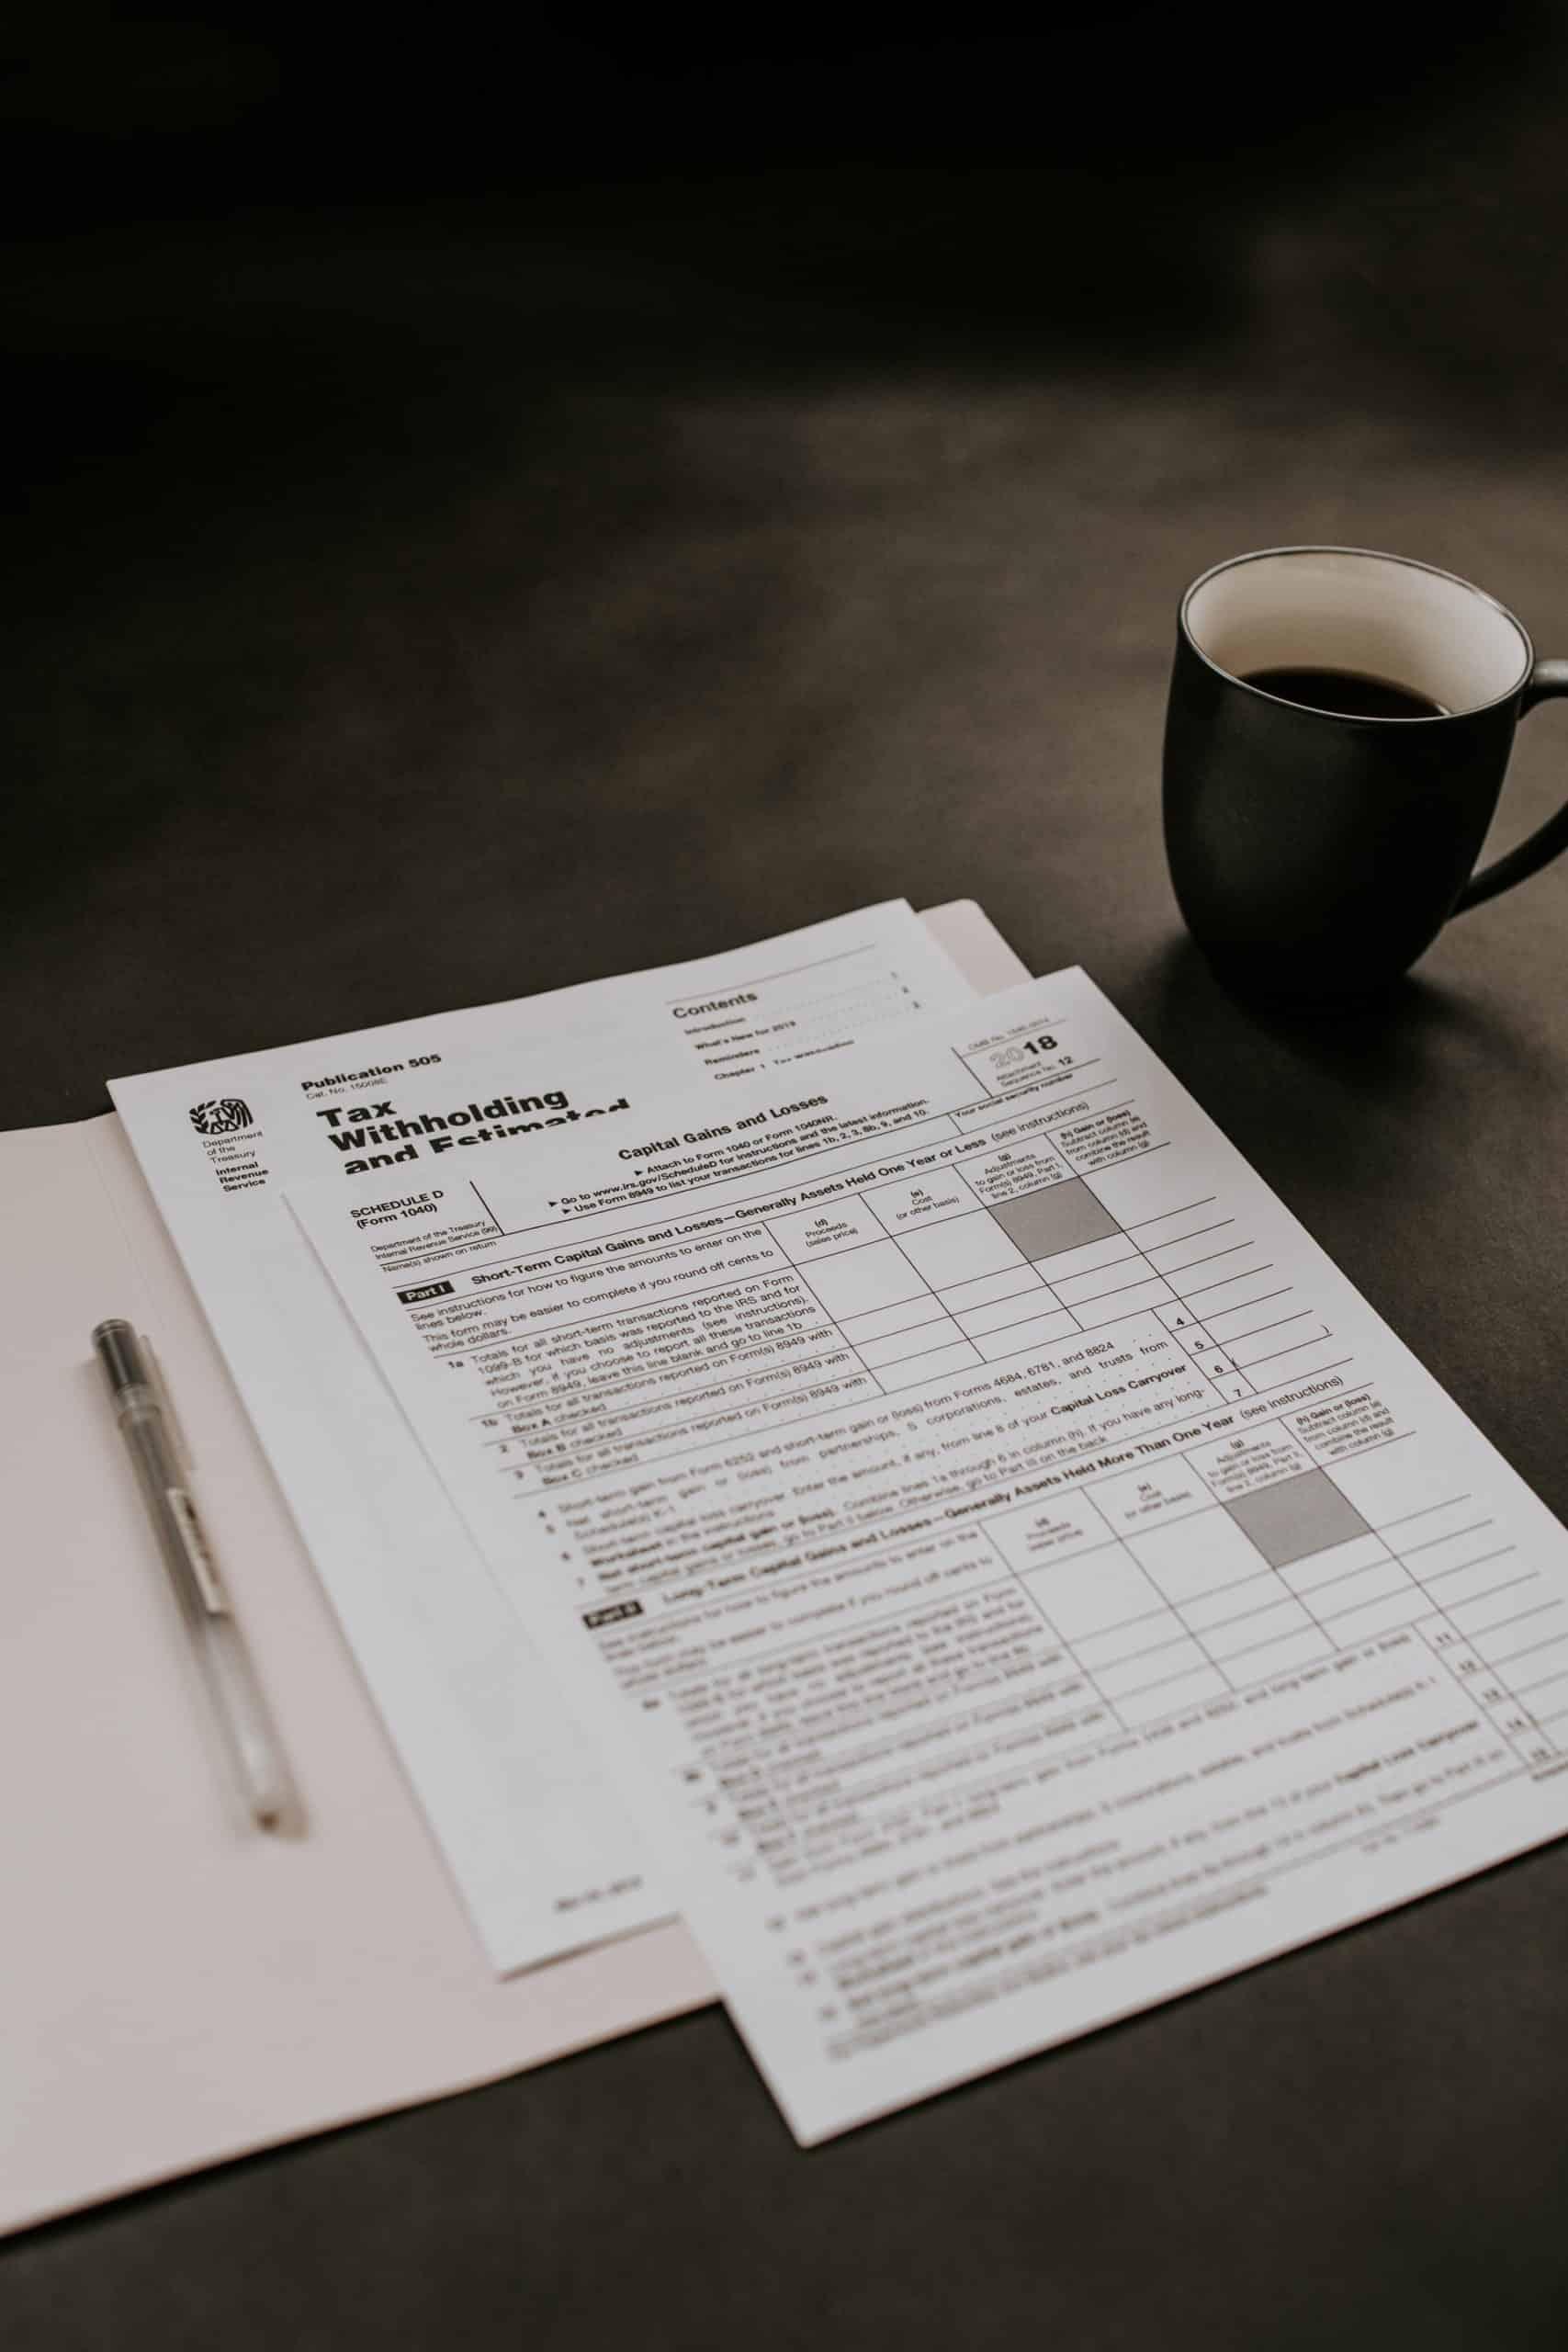 Tax Preparer Guide Article Image